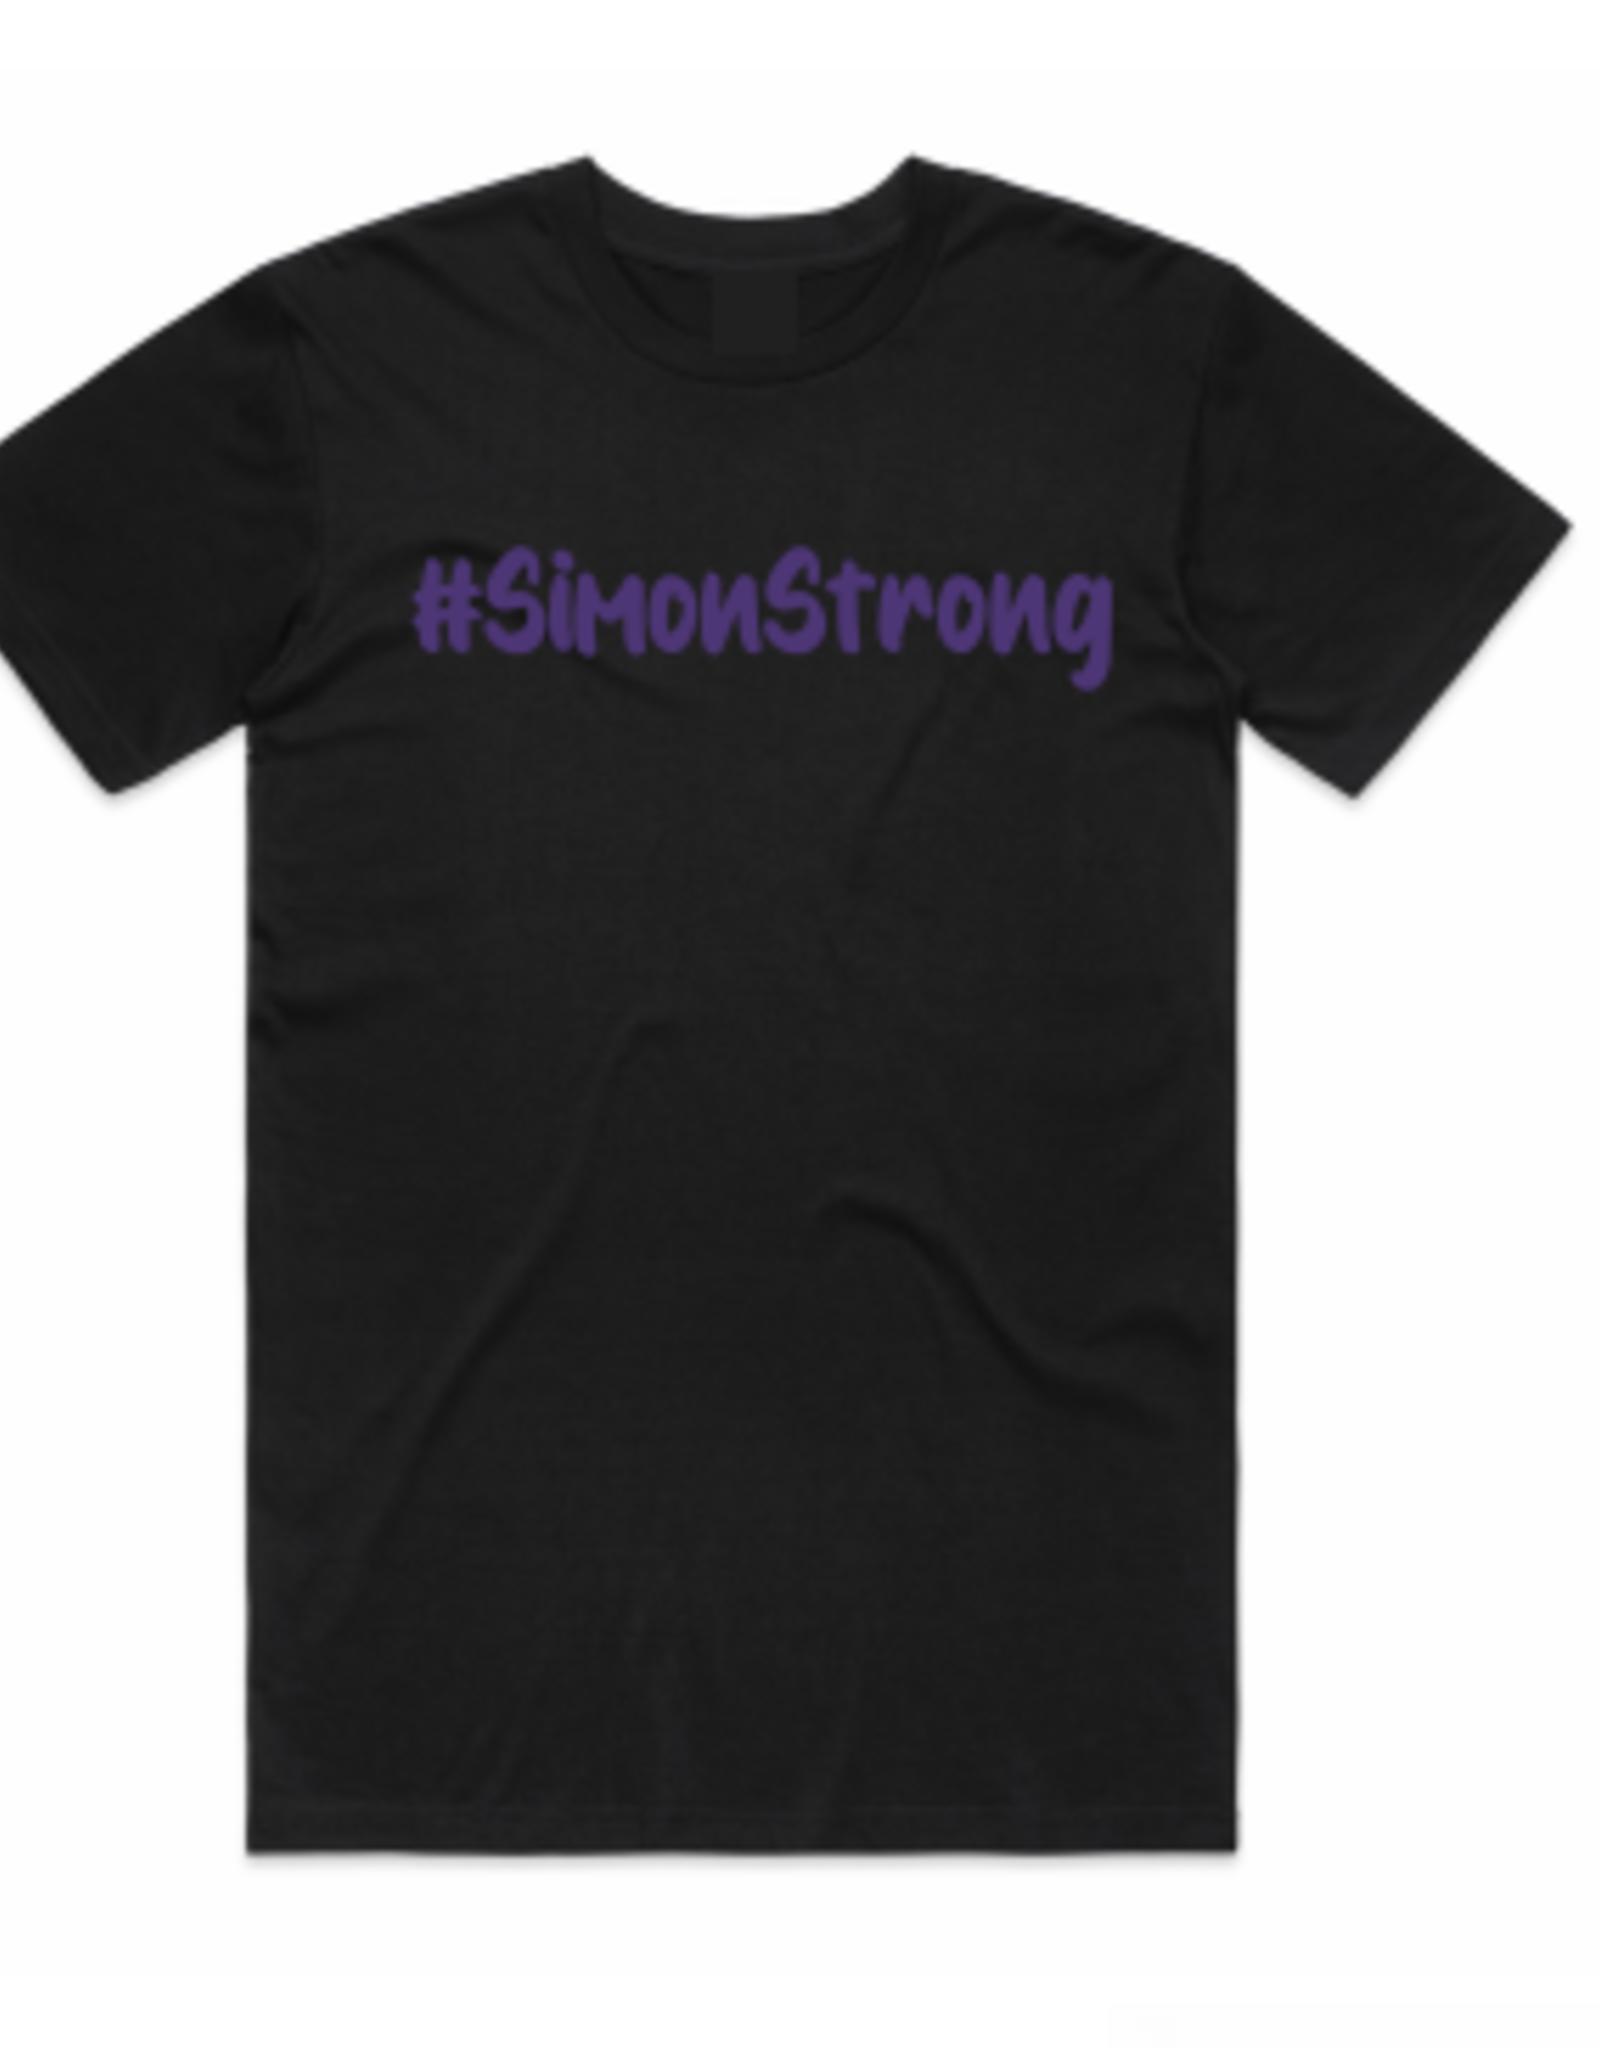 5050bmx #SimonStrong Tee SM